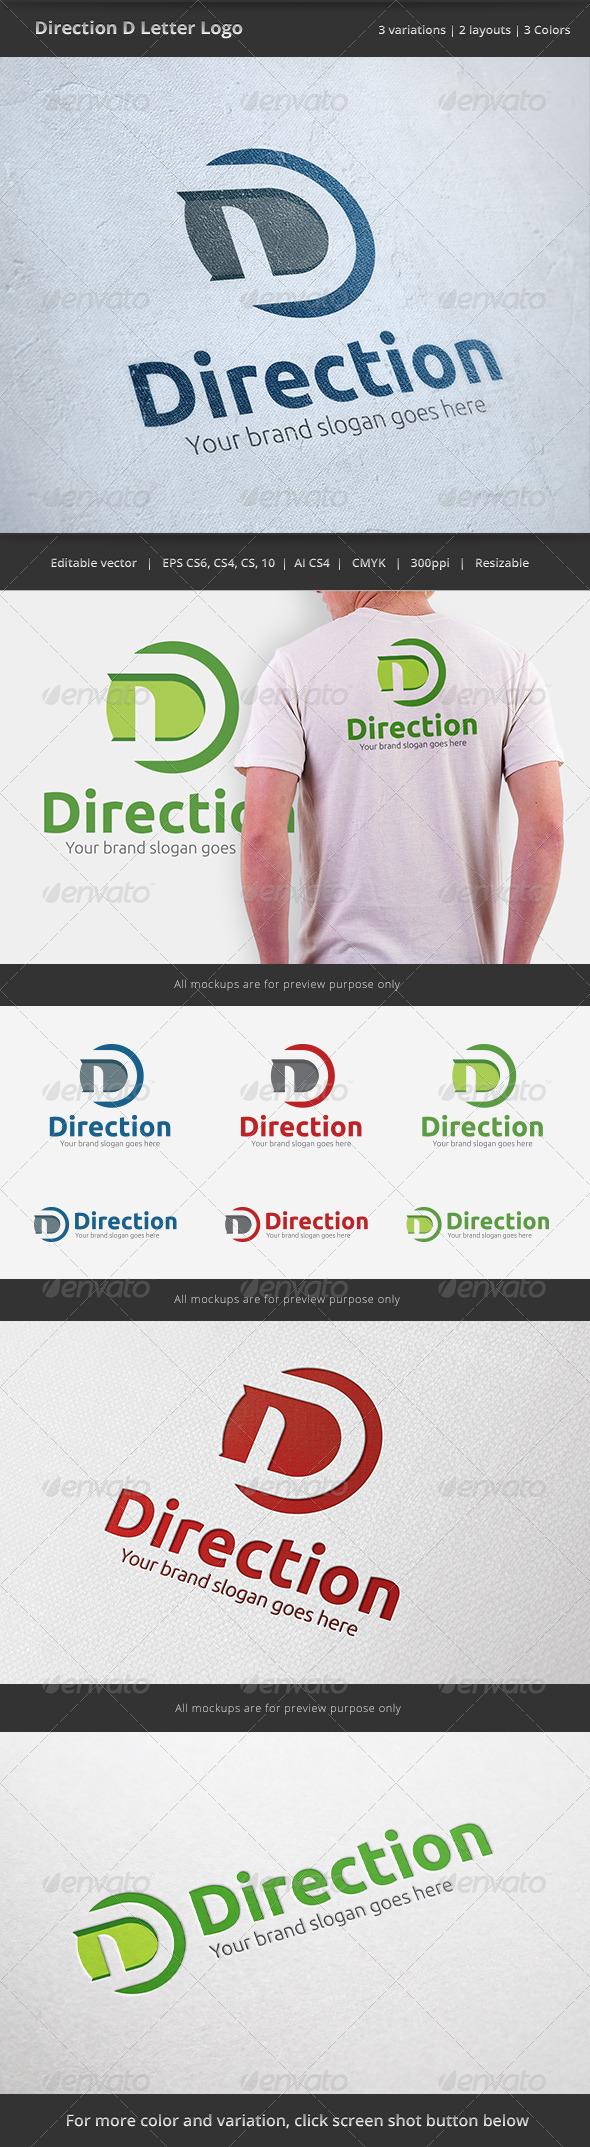 Direction D Letter Logo - Letters Logo Templates